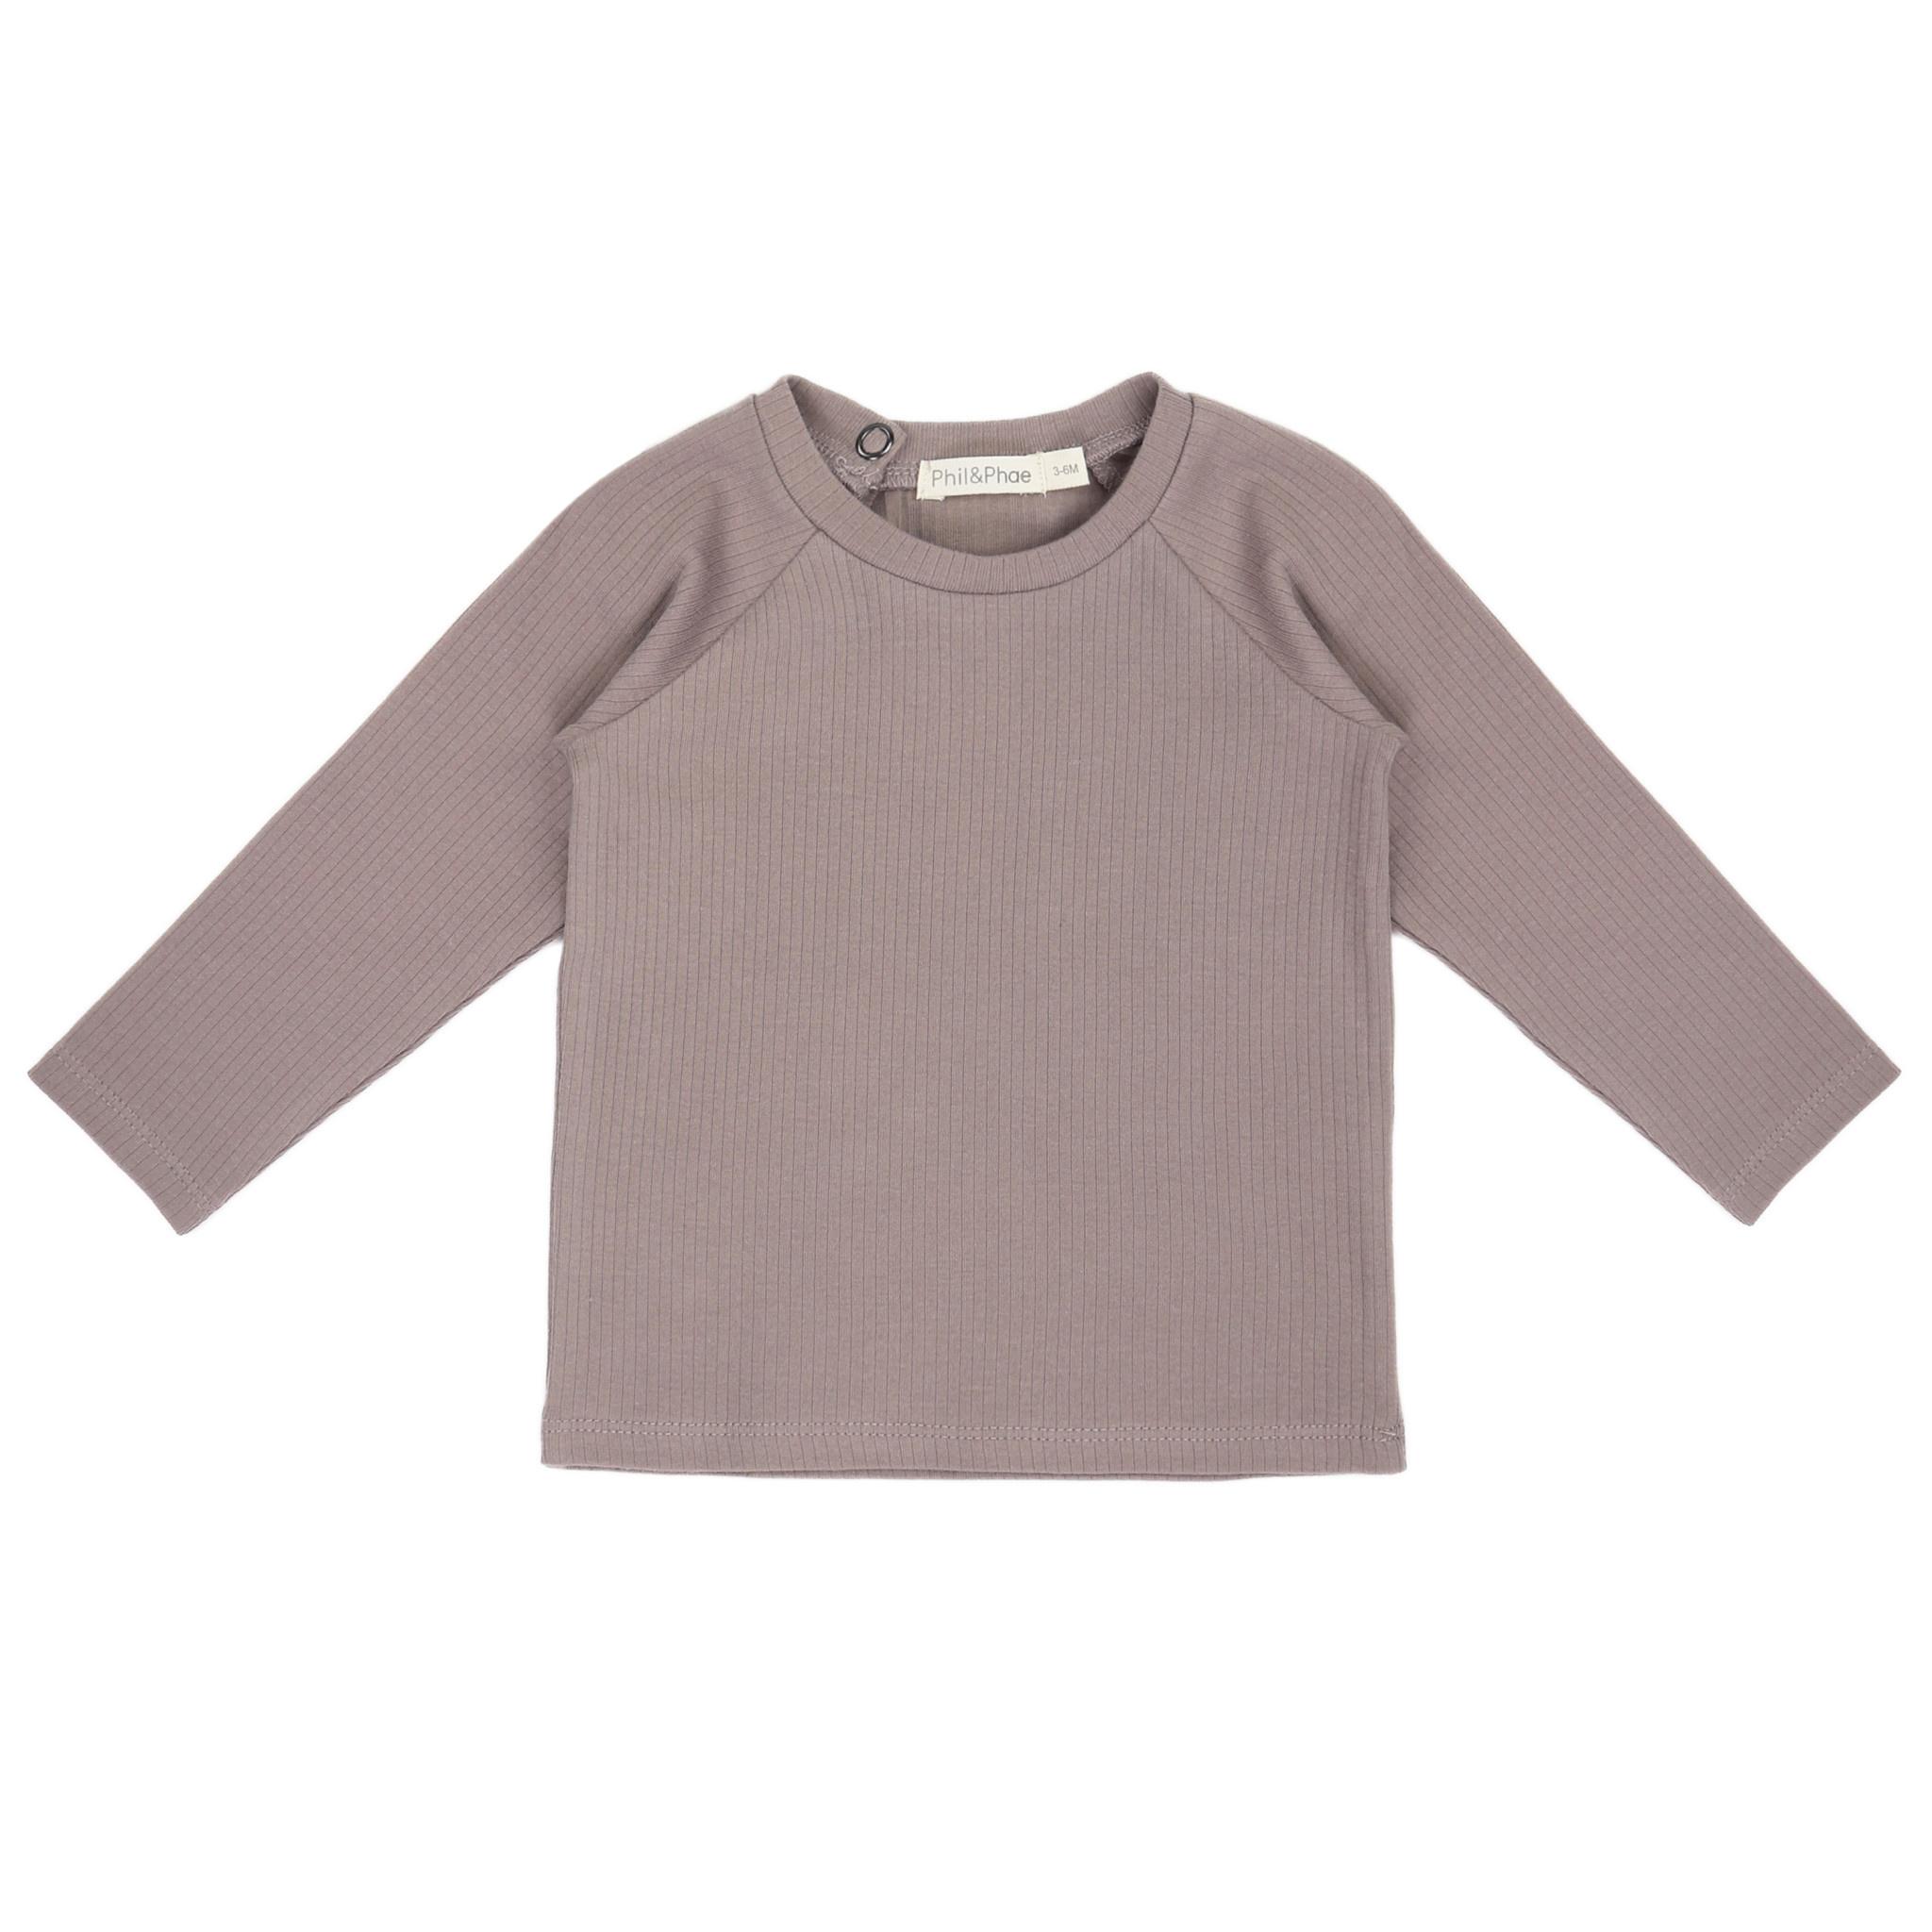 Phil&Phae Phil & Phae -Baby Rib T-shirt Long Sleeves